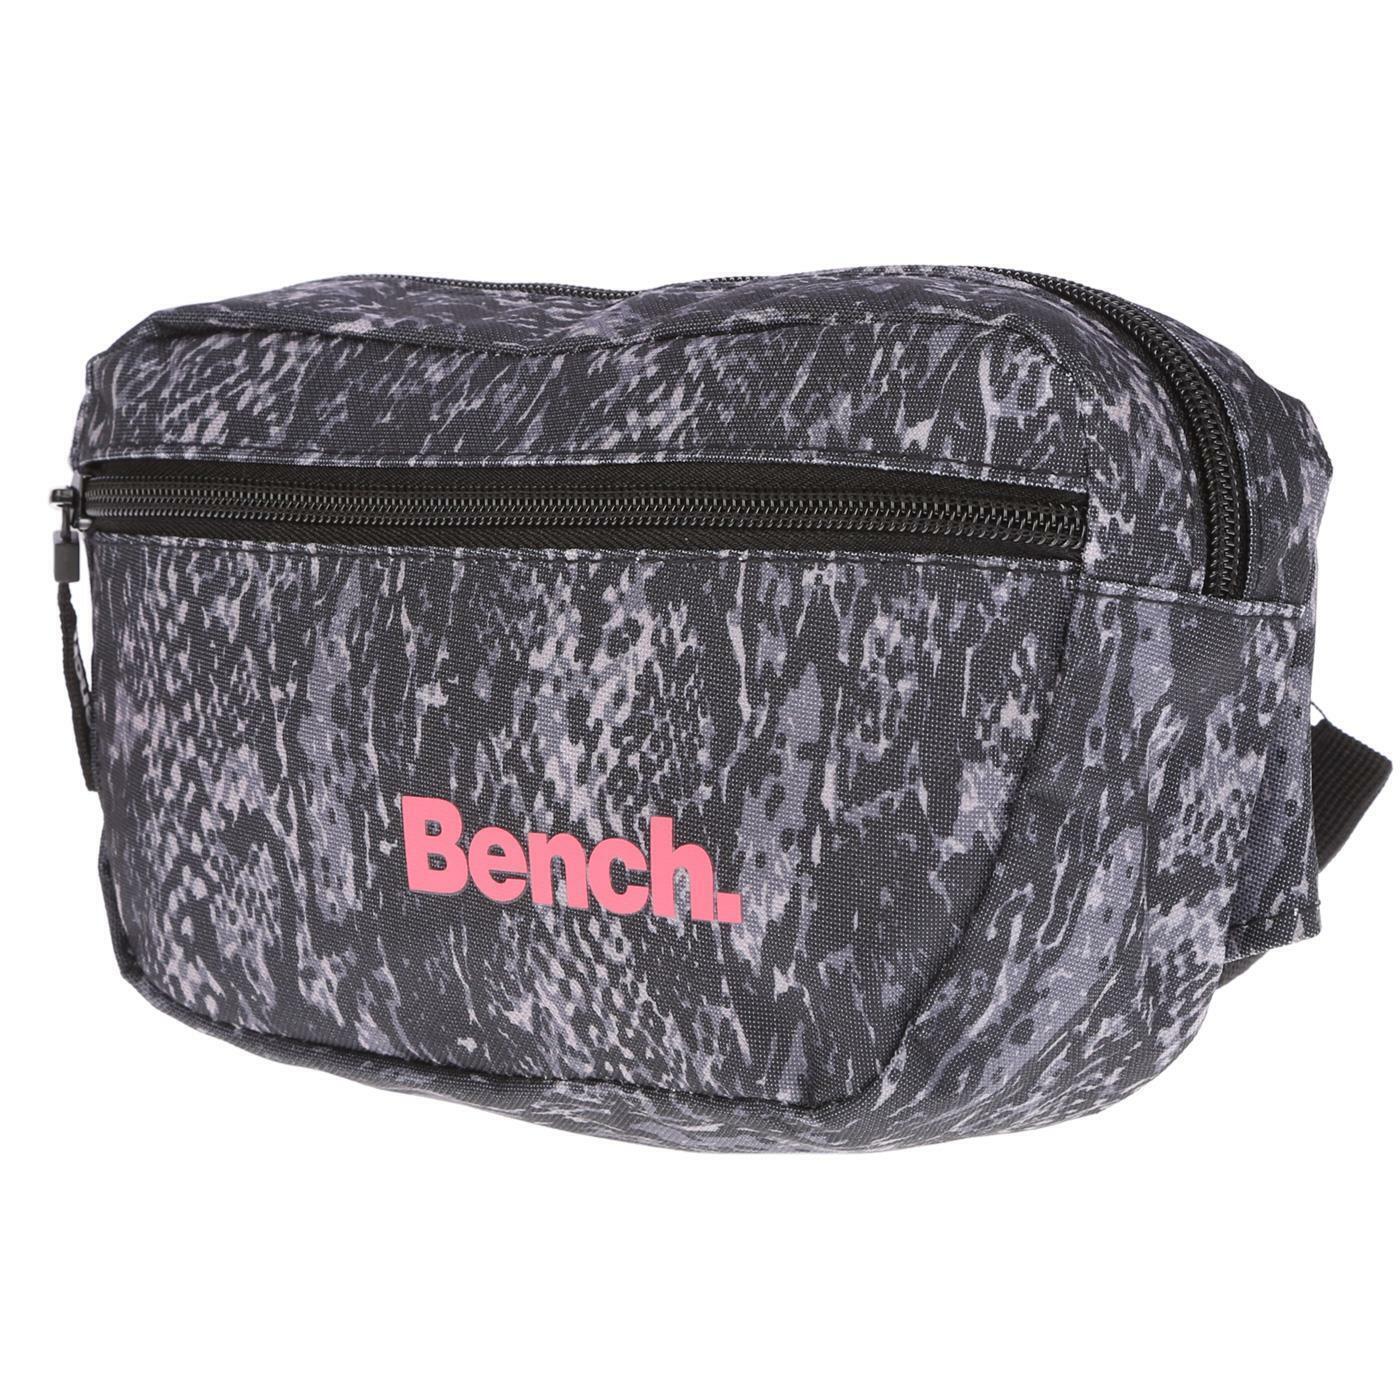 Eastpak Doggy Bag Gürteltasche bush khaki Bauchtasche Freizeit Tasche EK07349S